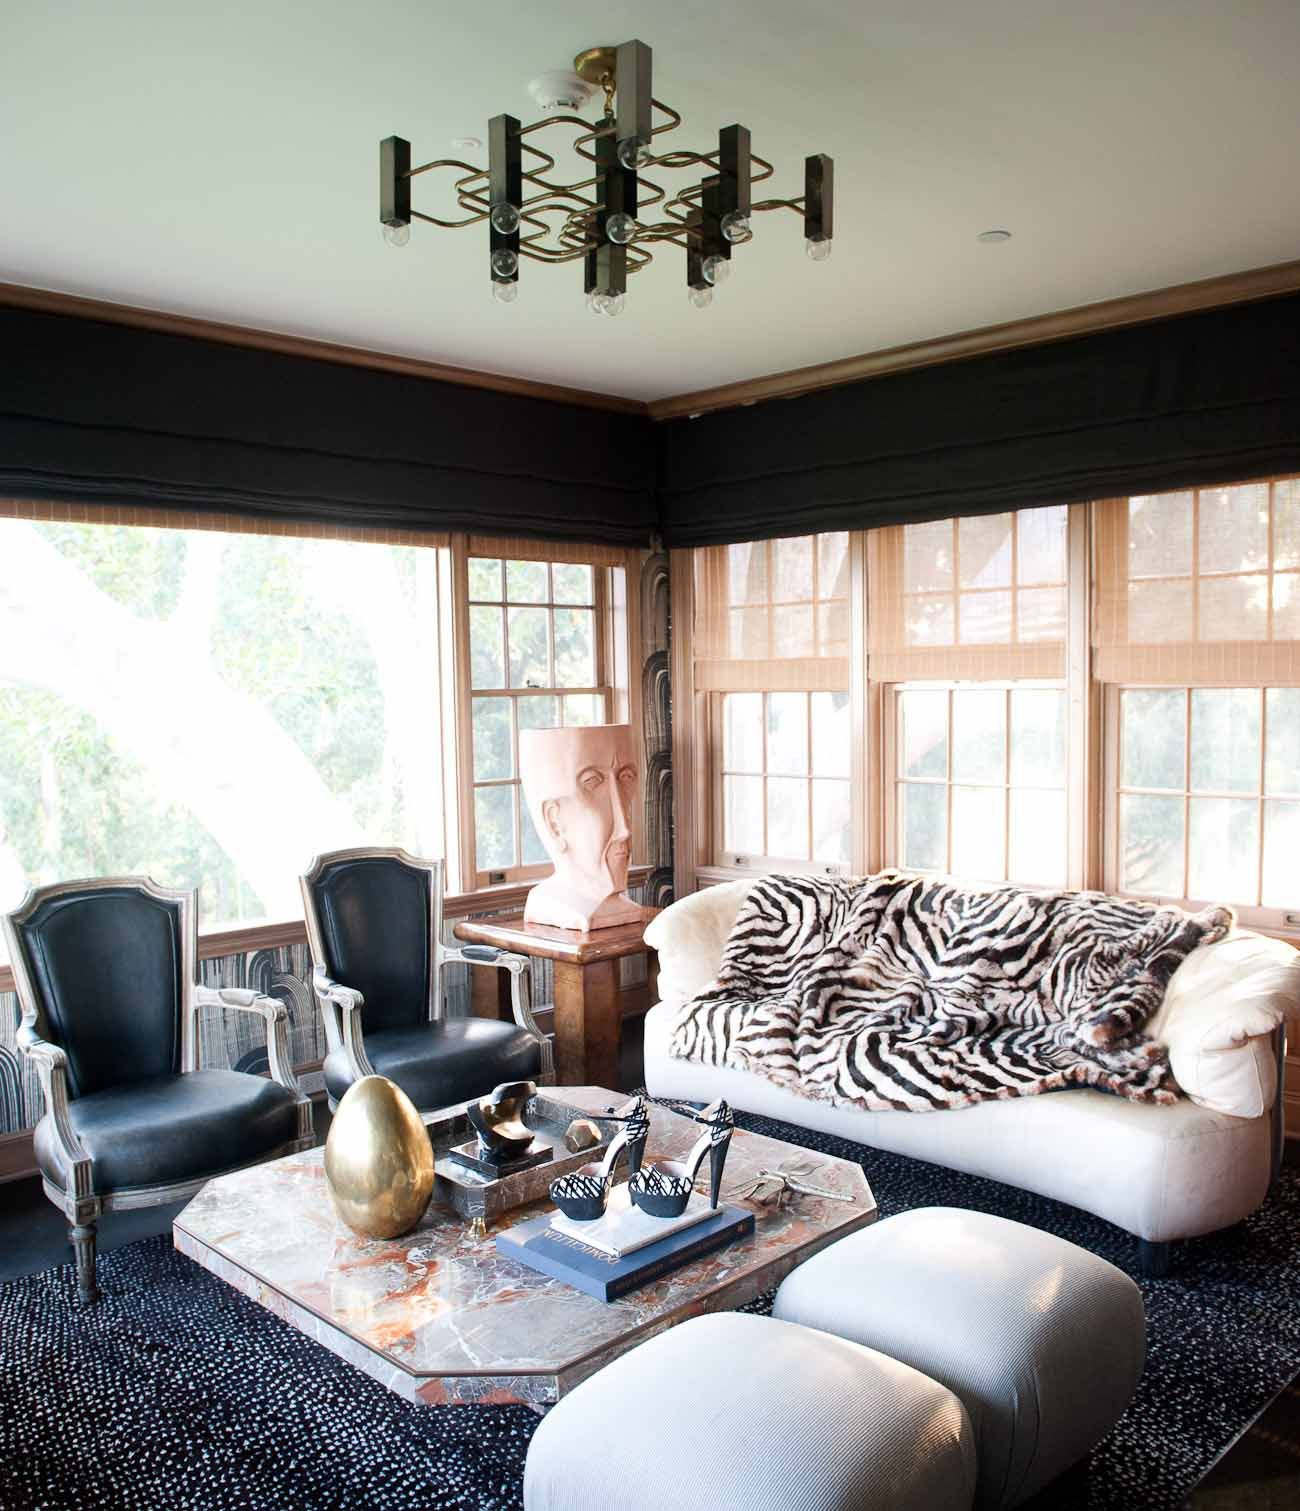 Glamorous Interior Design By Kelly Wearstler: Pin By Mukash Nurgali On Grey Decor